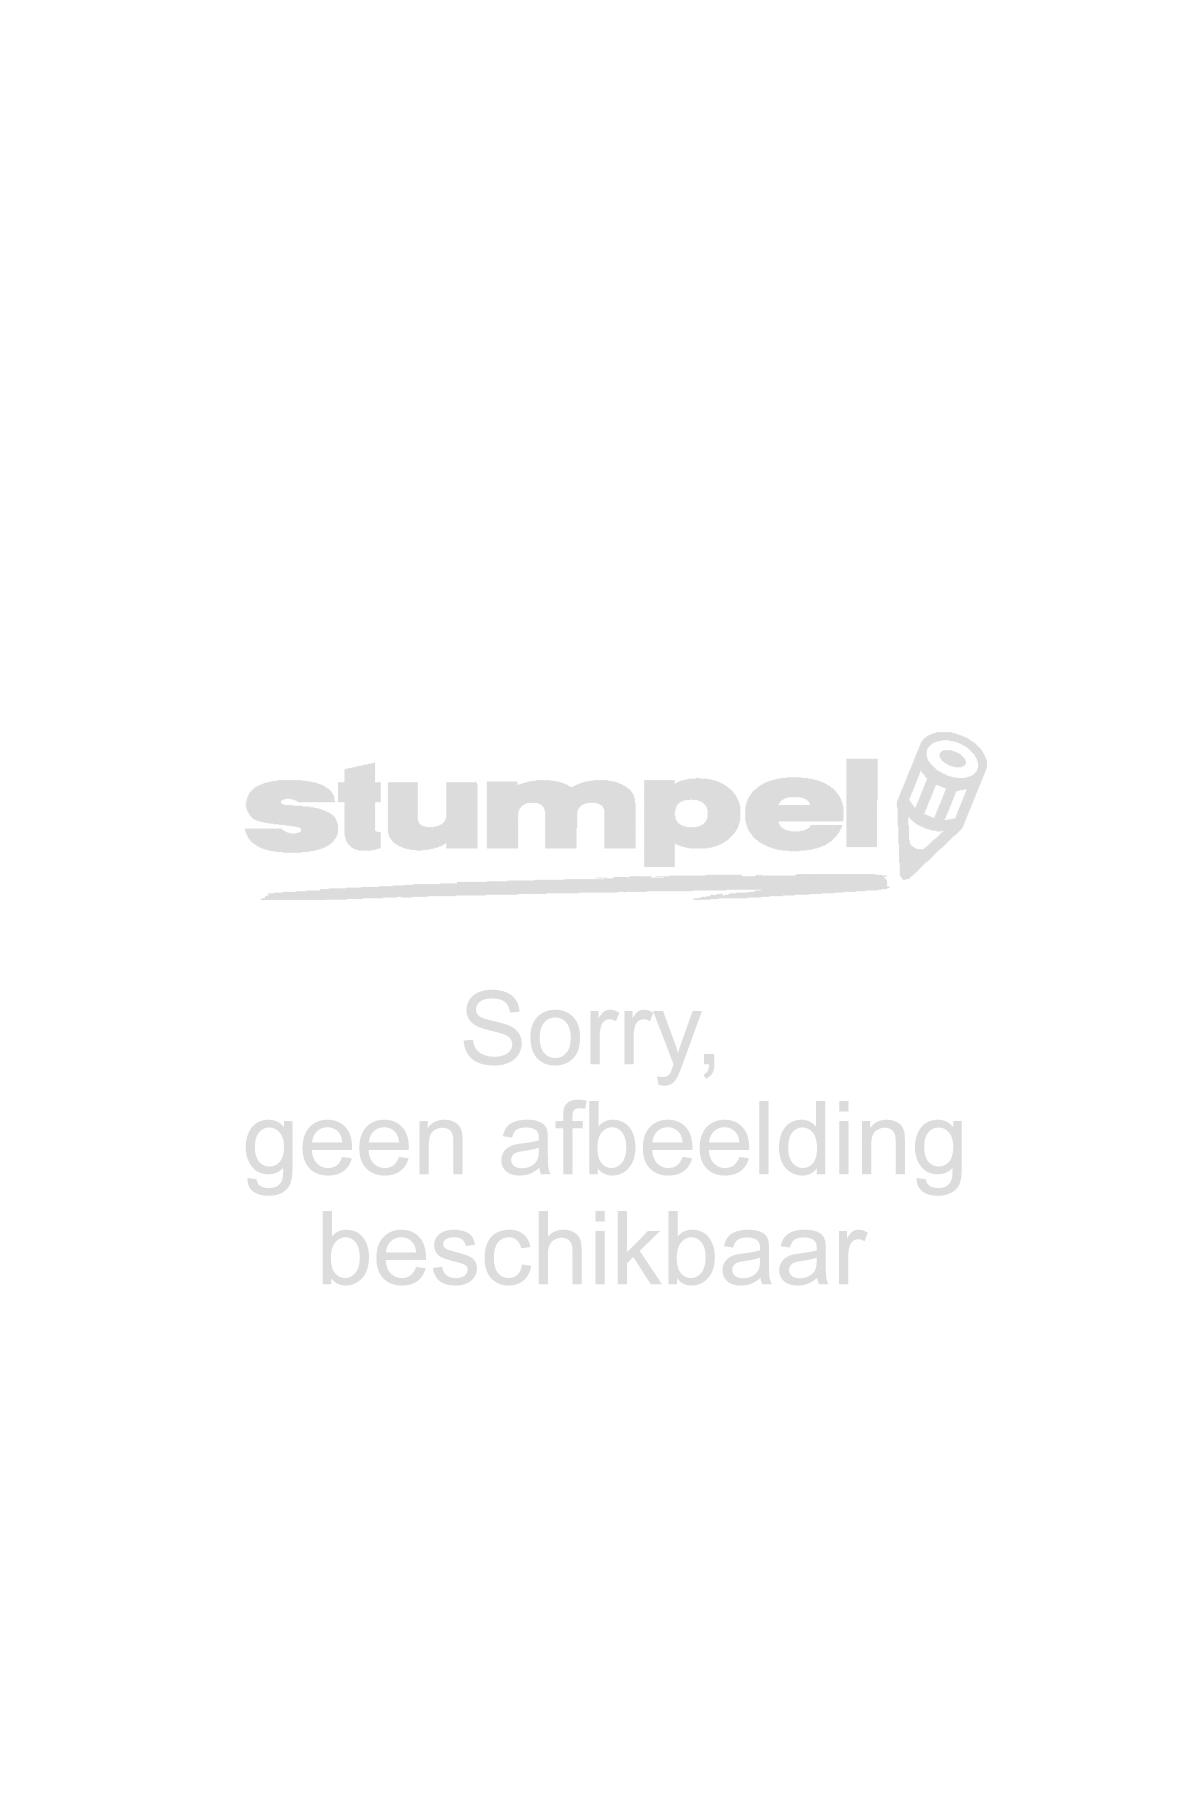 agenda-2021-ryam-weekplan-wit-nl-mundior-zwart-11010944